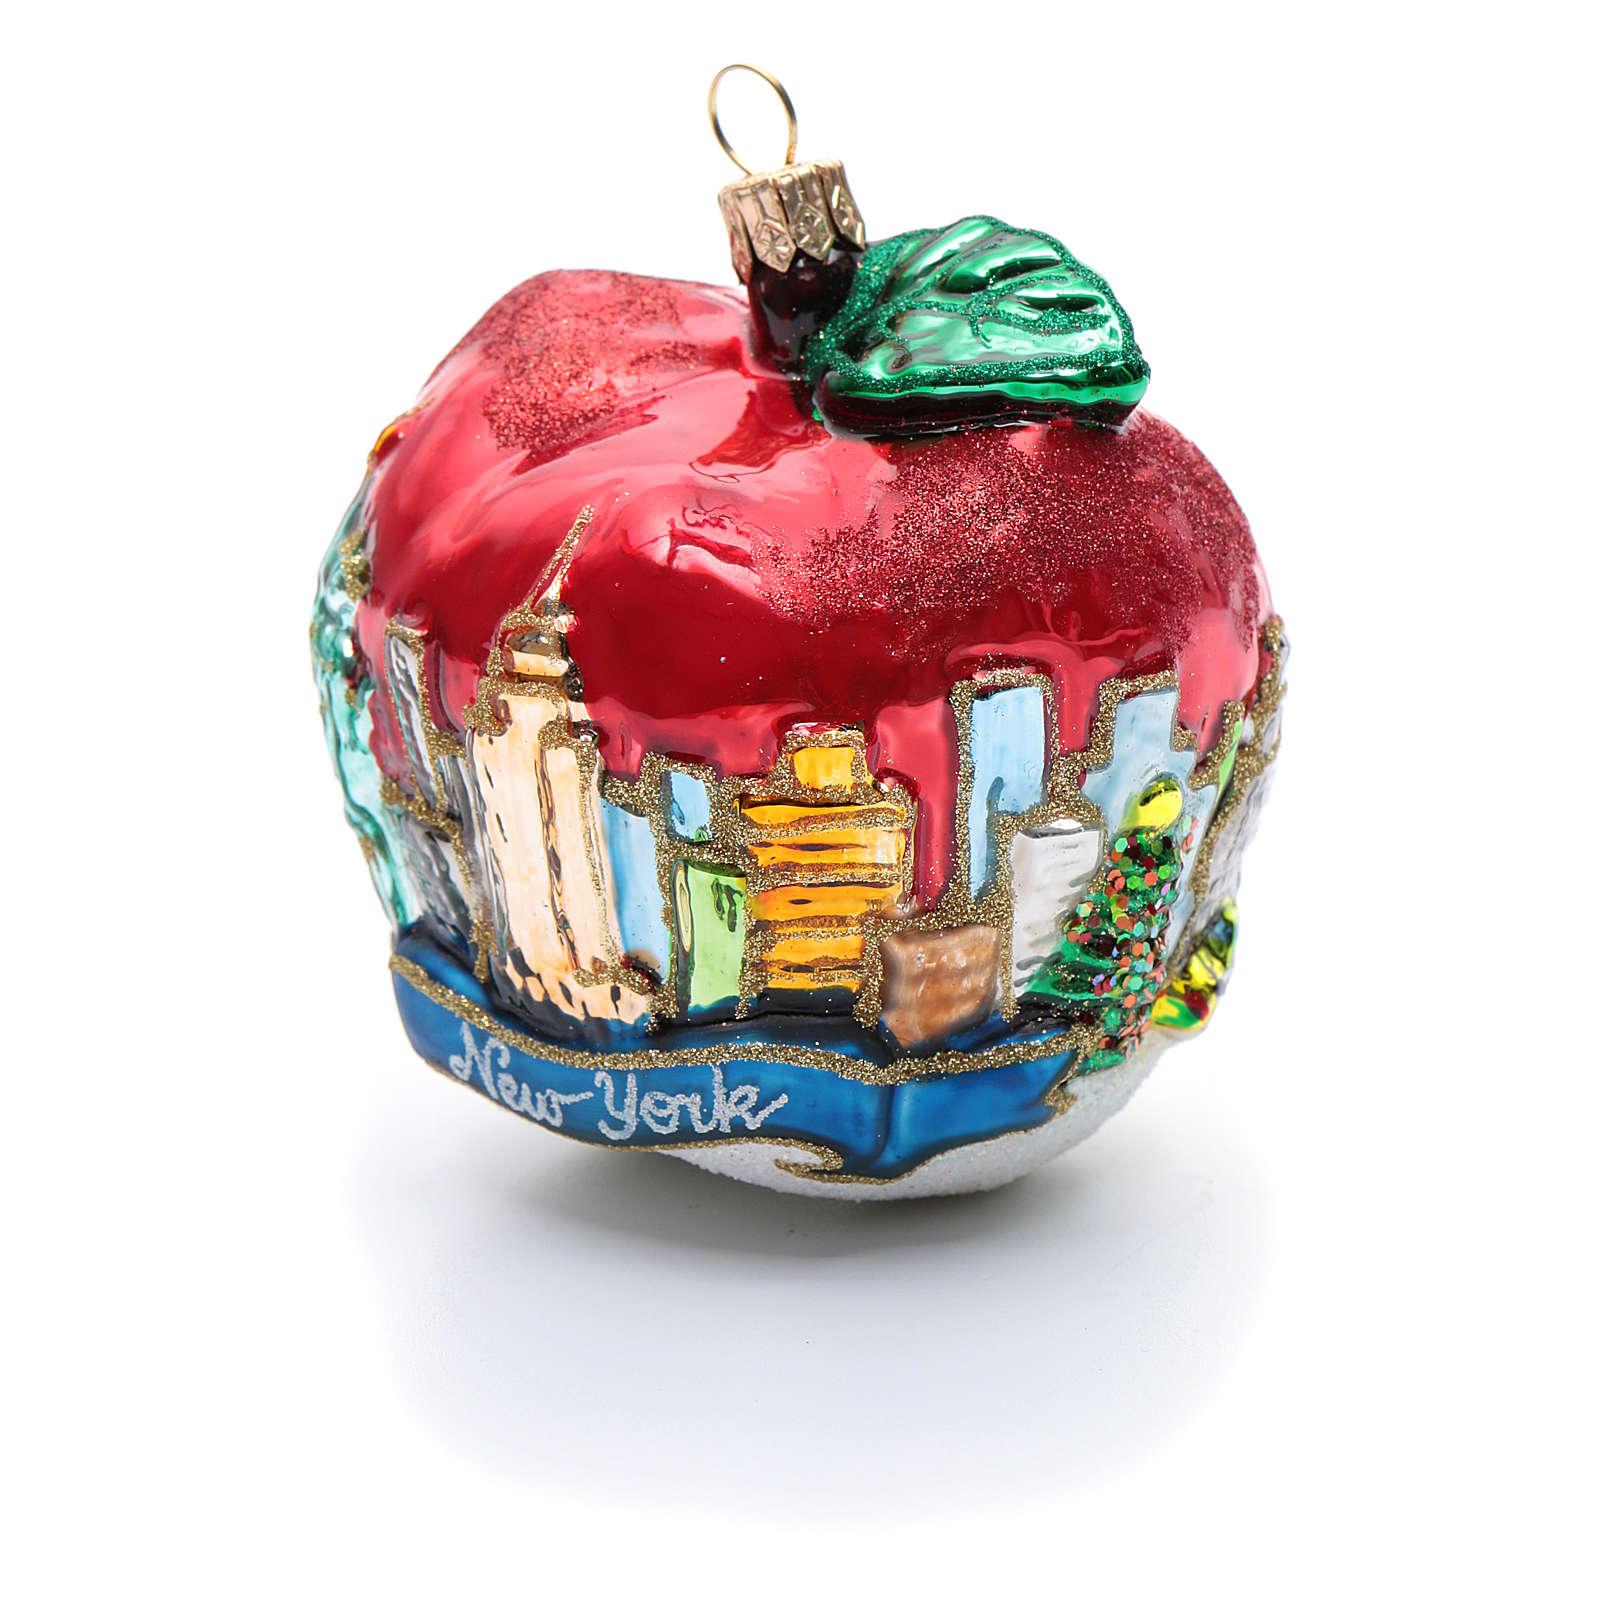 Blown glass Christmas ornament, New York Apple 4